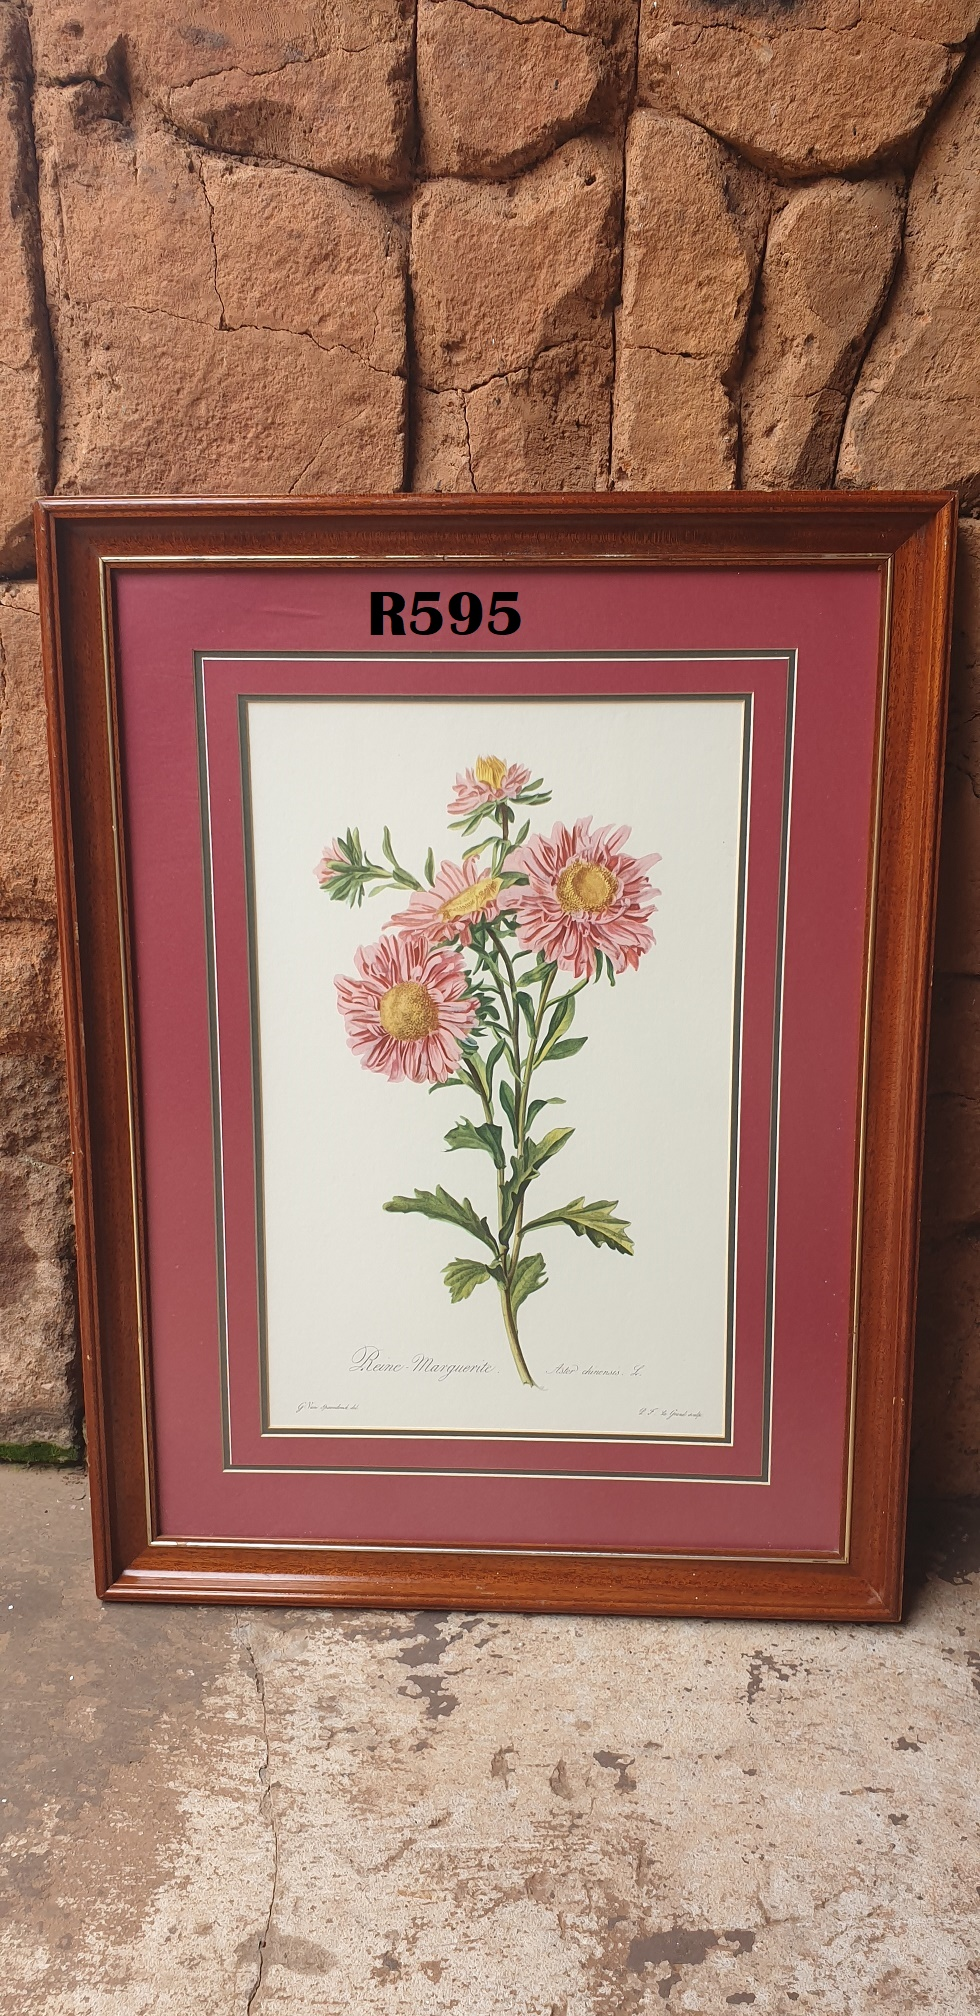 Framed Gerhard van Spaendonck Rose Print (520x685)